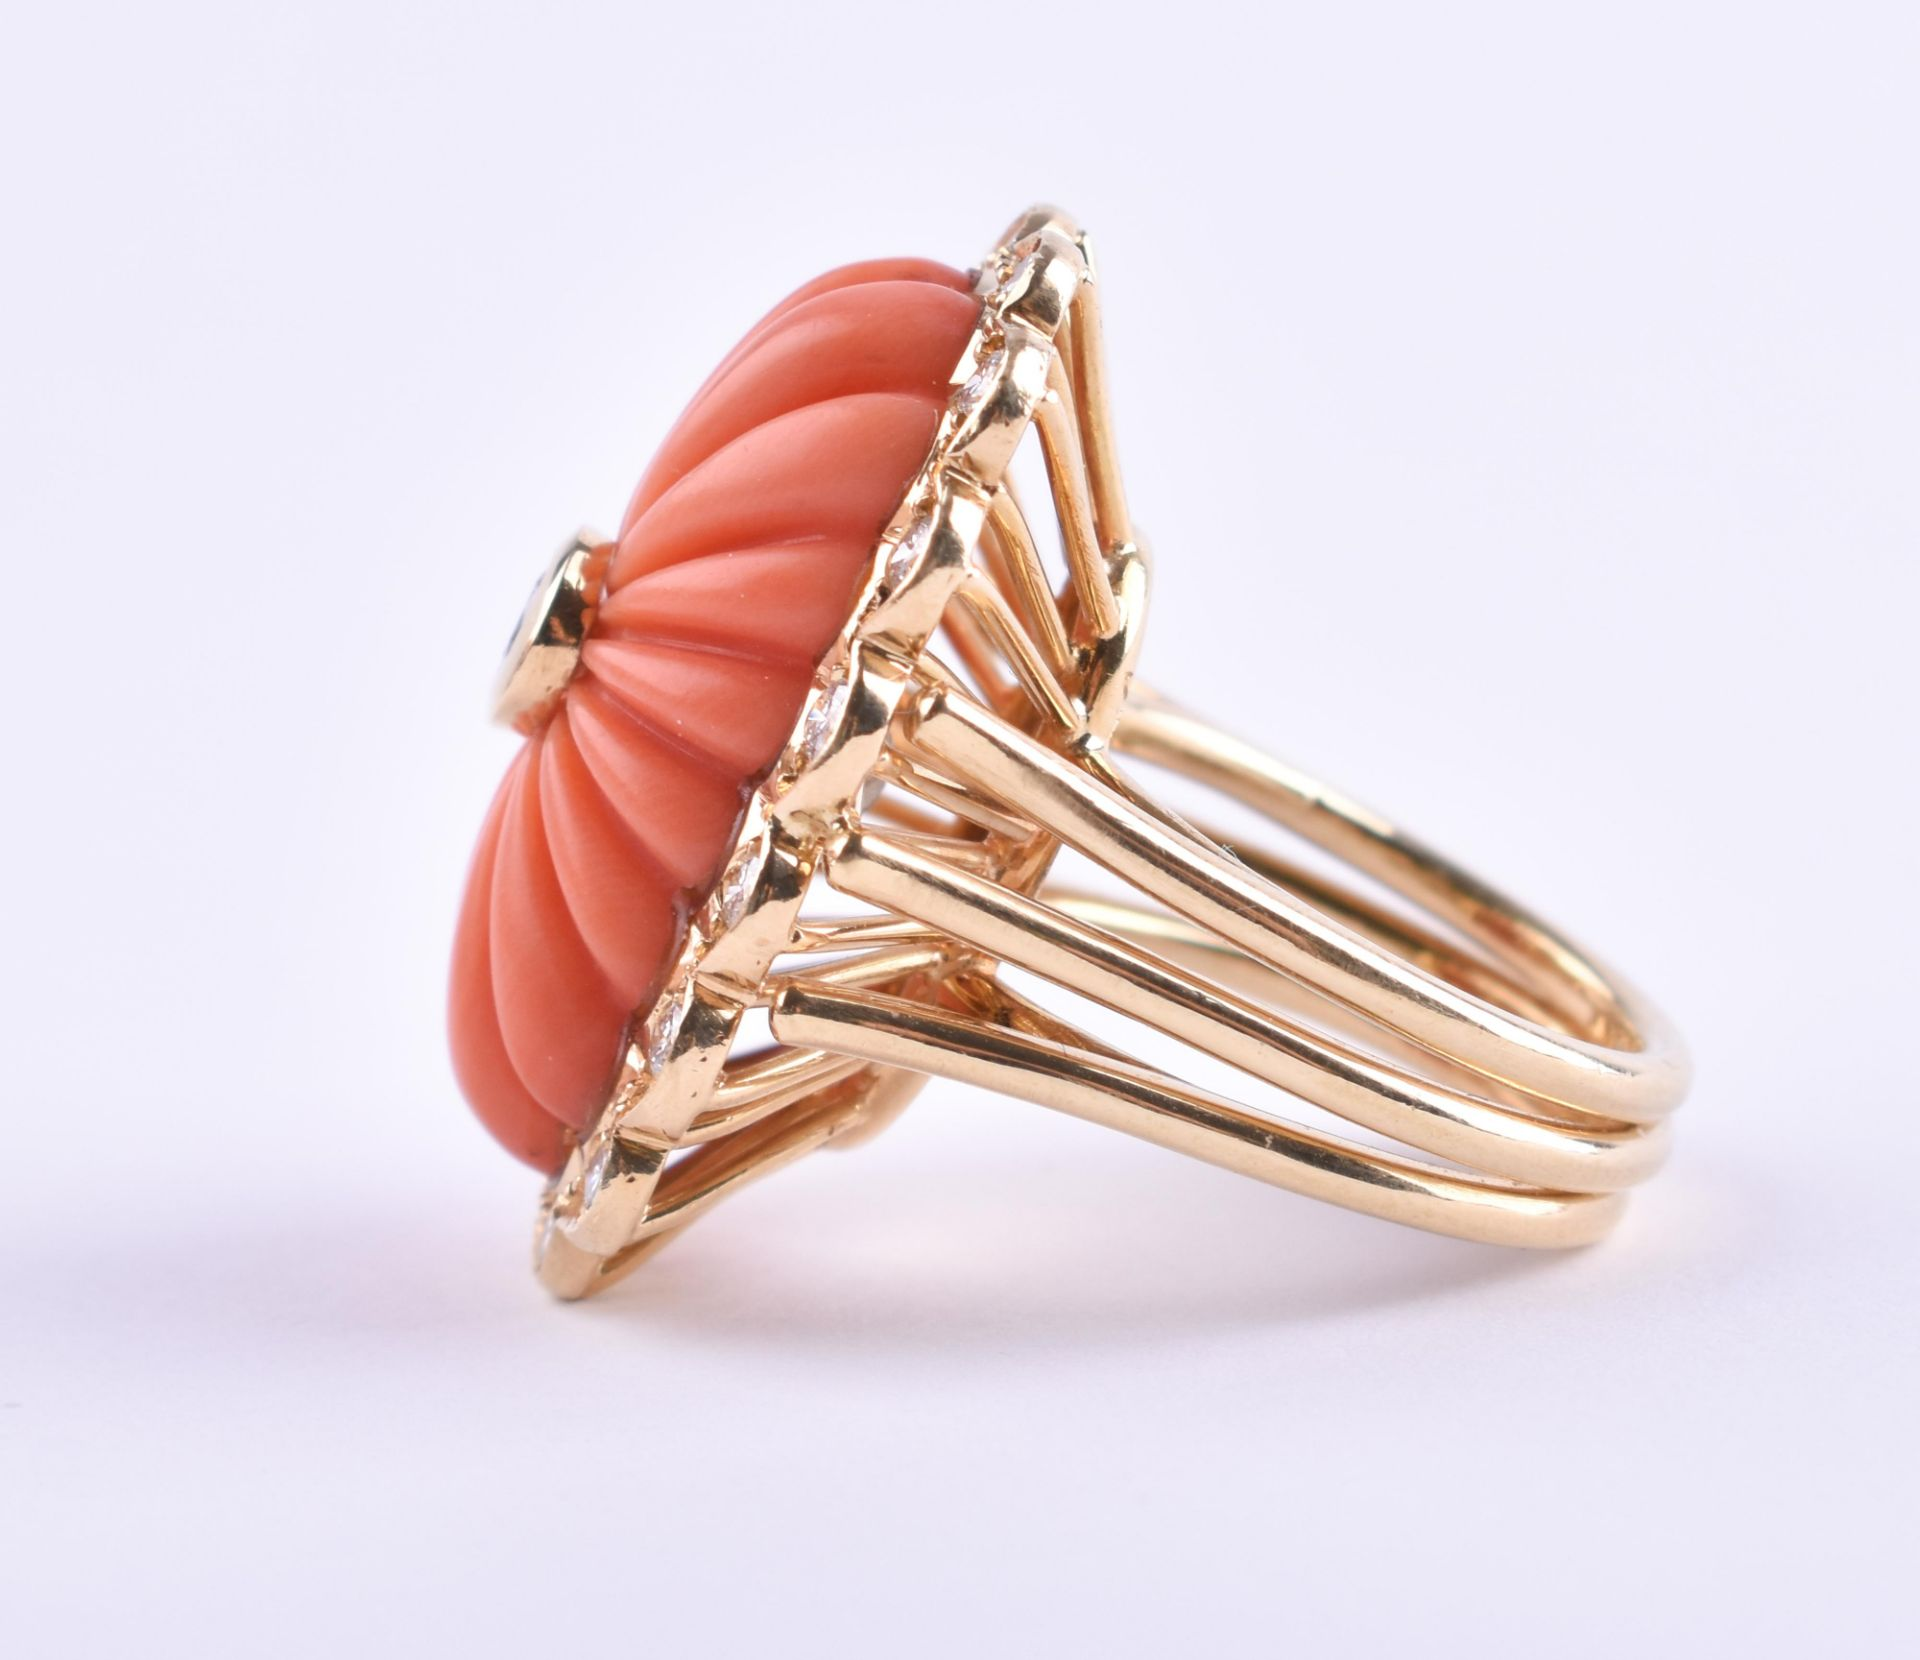 Ladies coral diamond ring Cartier - Image 3 of 4